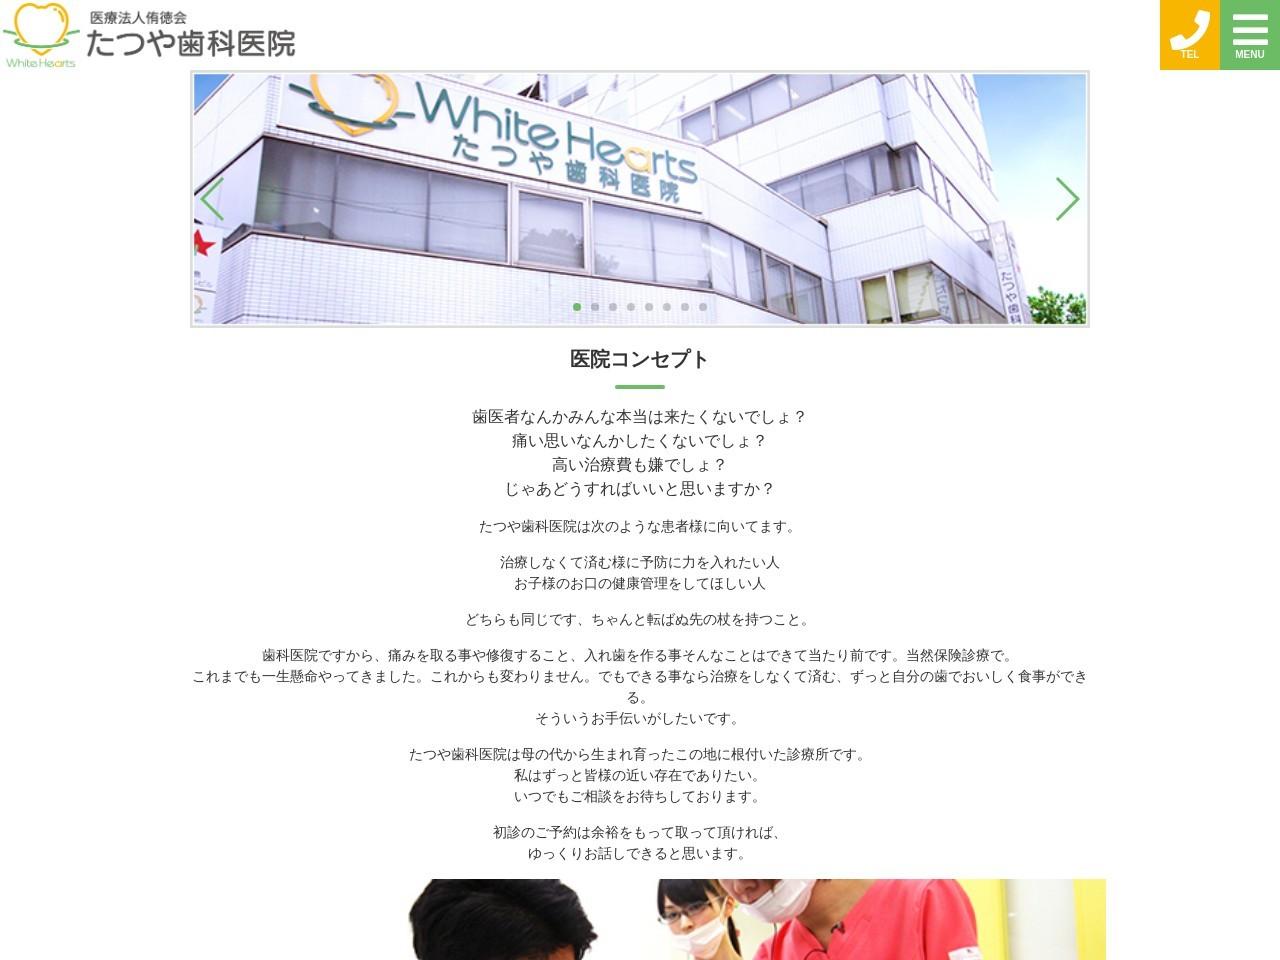 医療法人侑徳会  たつや歯科医院 (大阪府大阪市都島区)